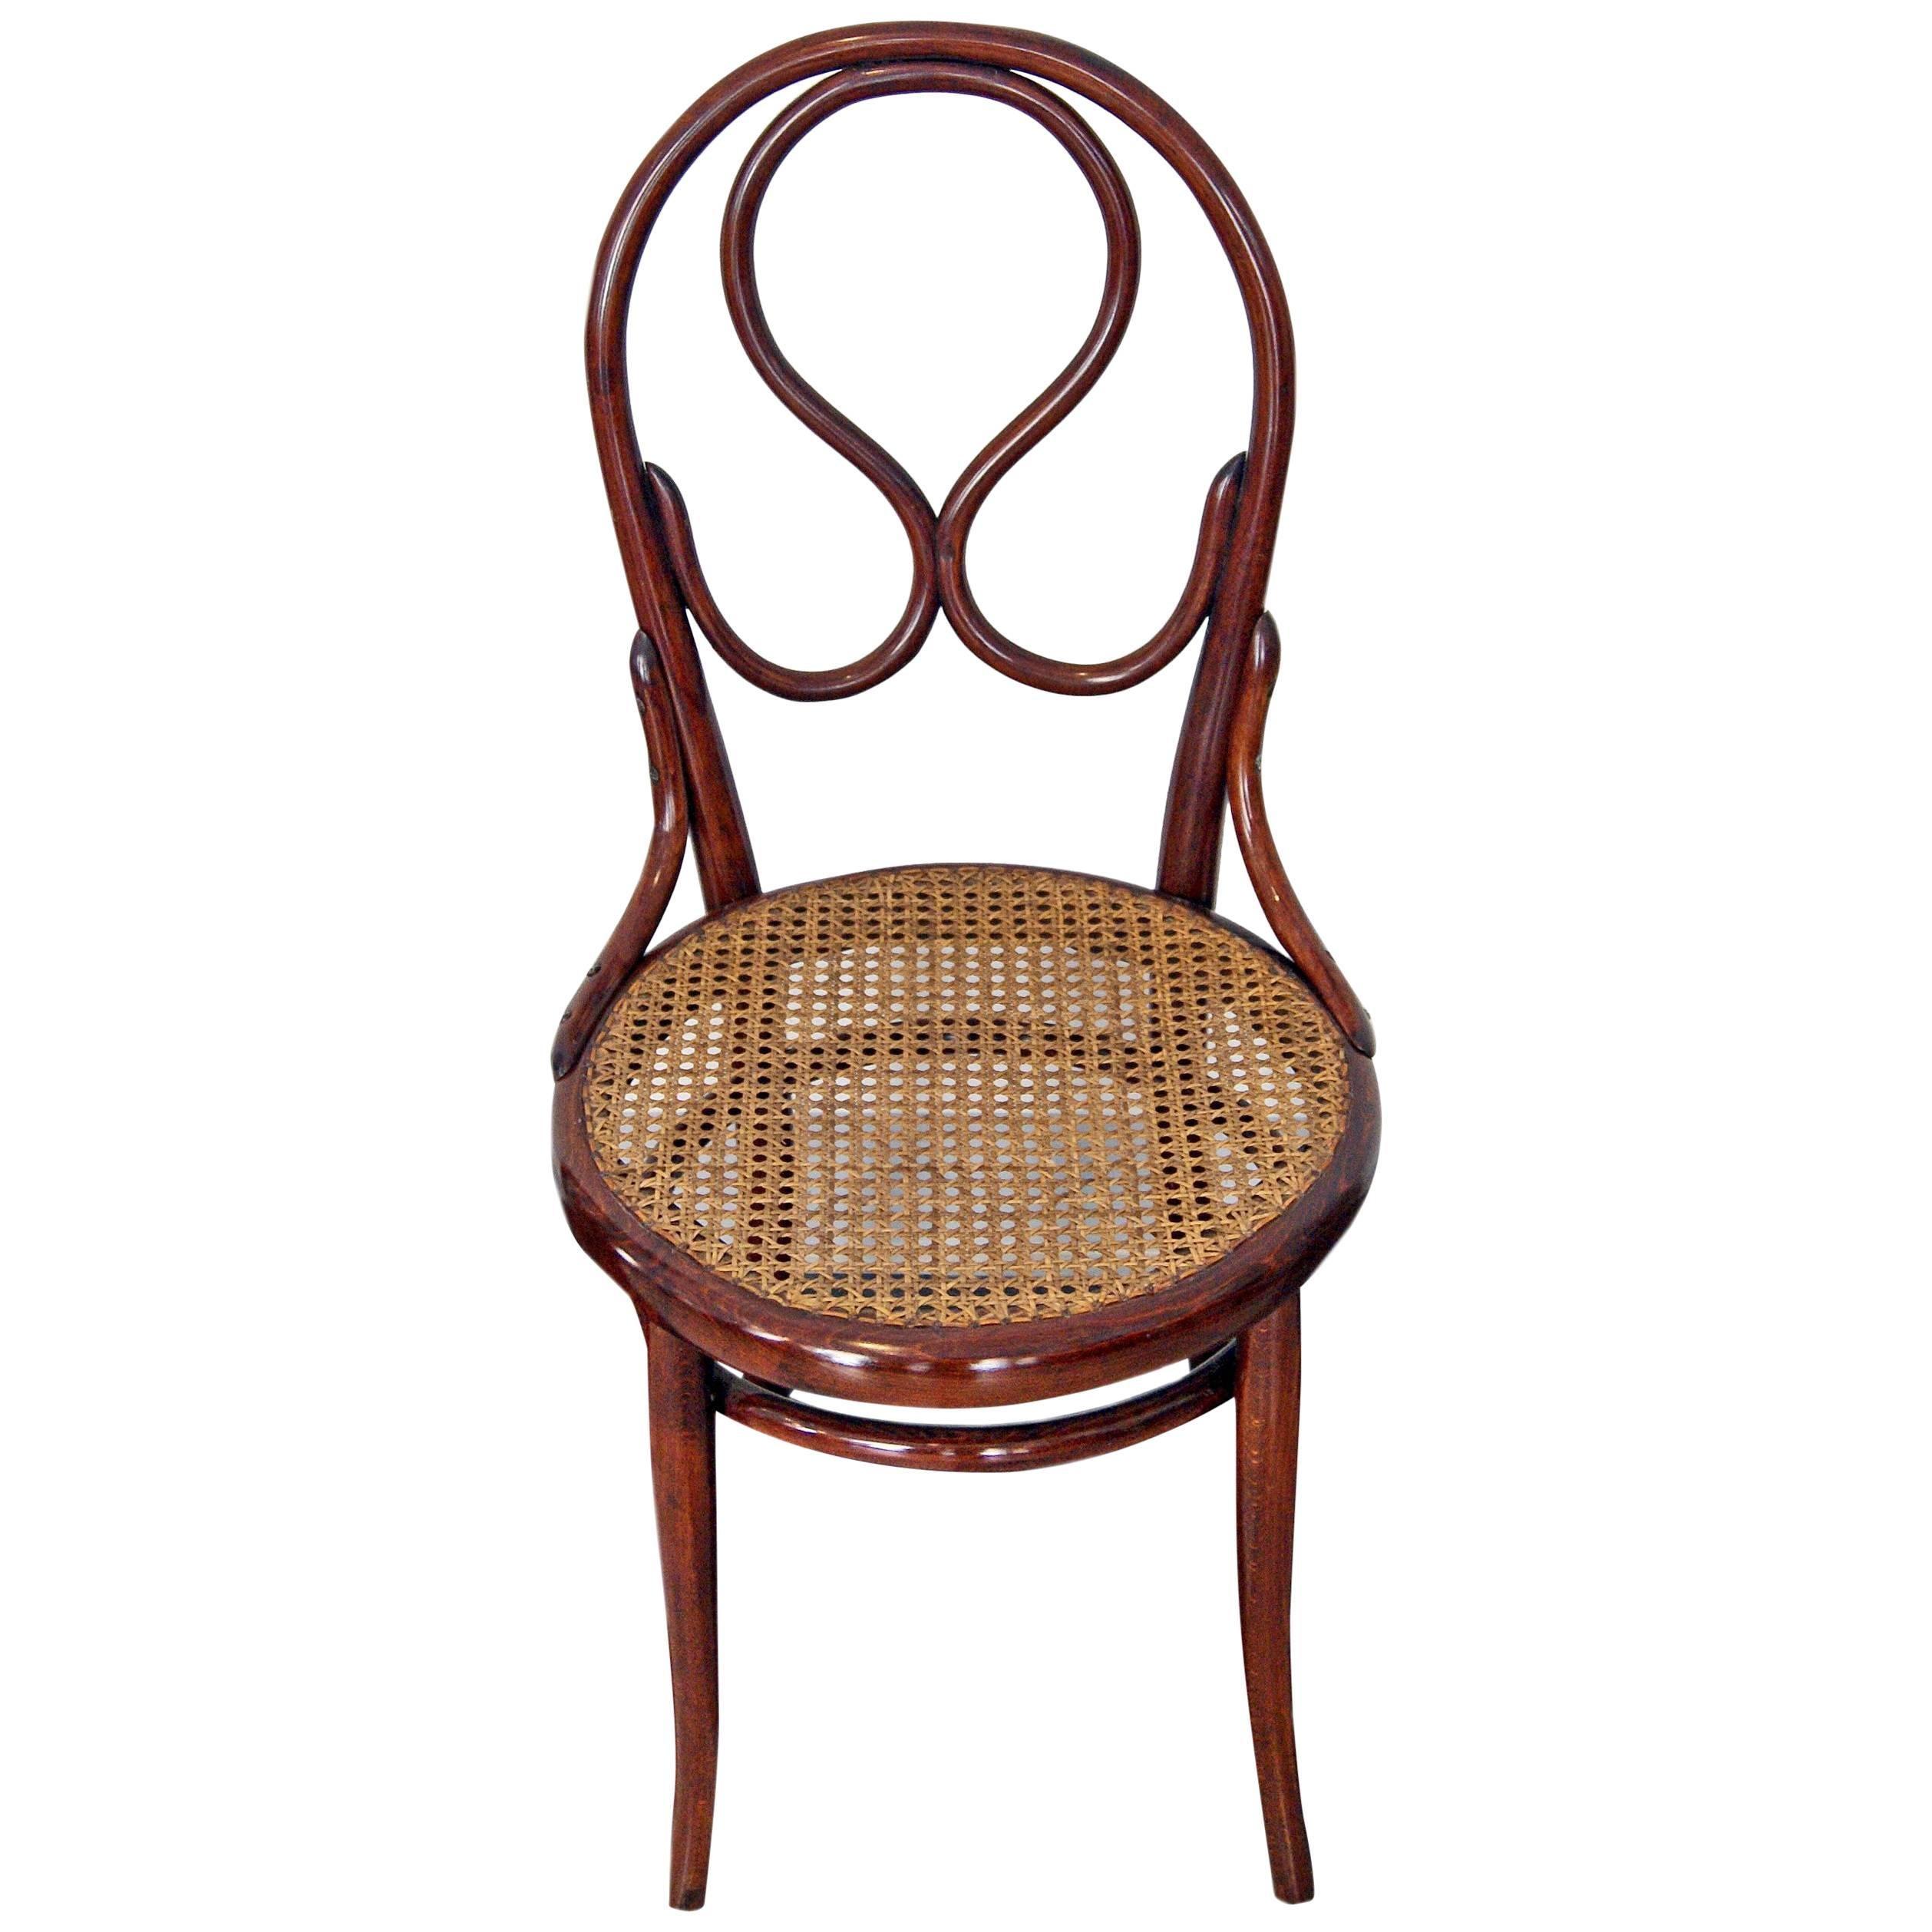 Exceptionnel Thonet Vienna Art Nouveau Chair Model 20 Made Circa 1880 For Sale